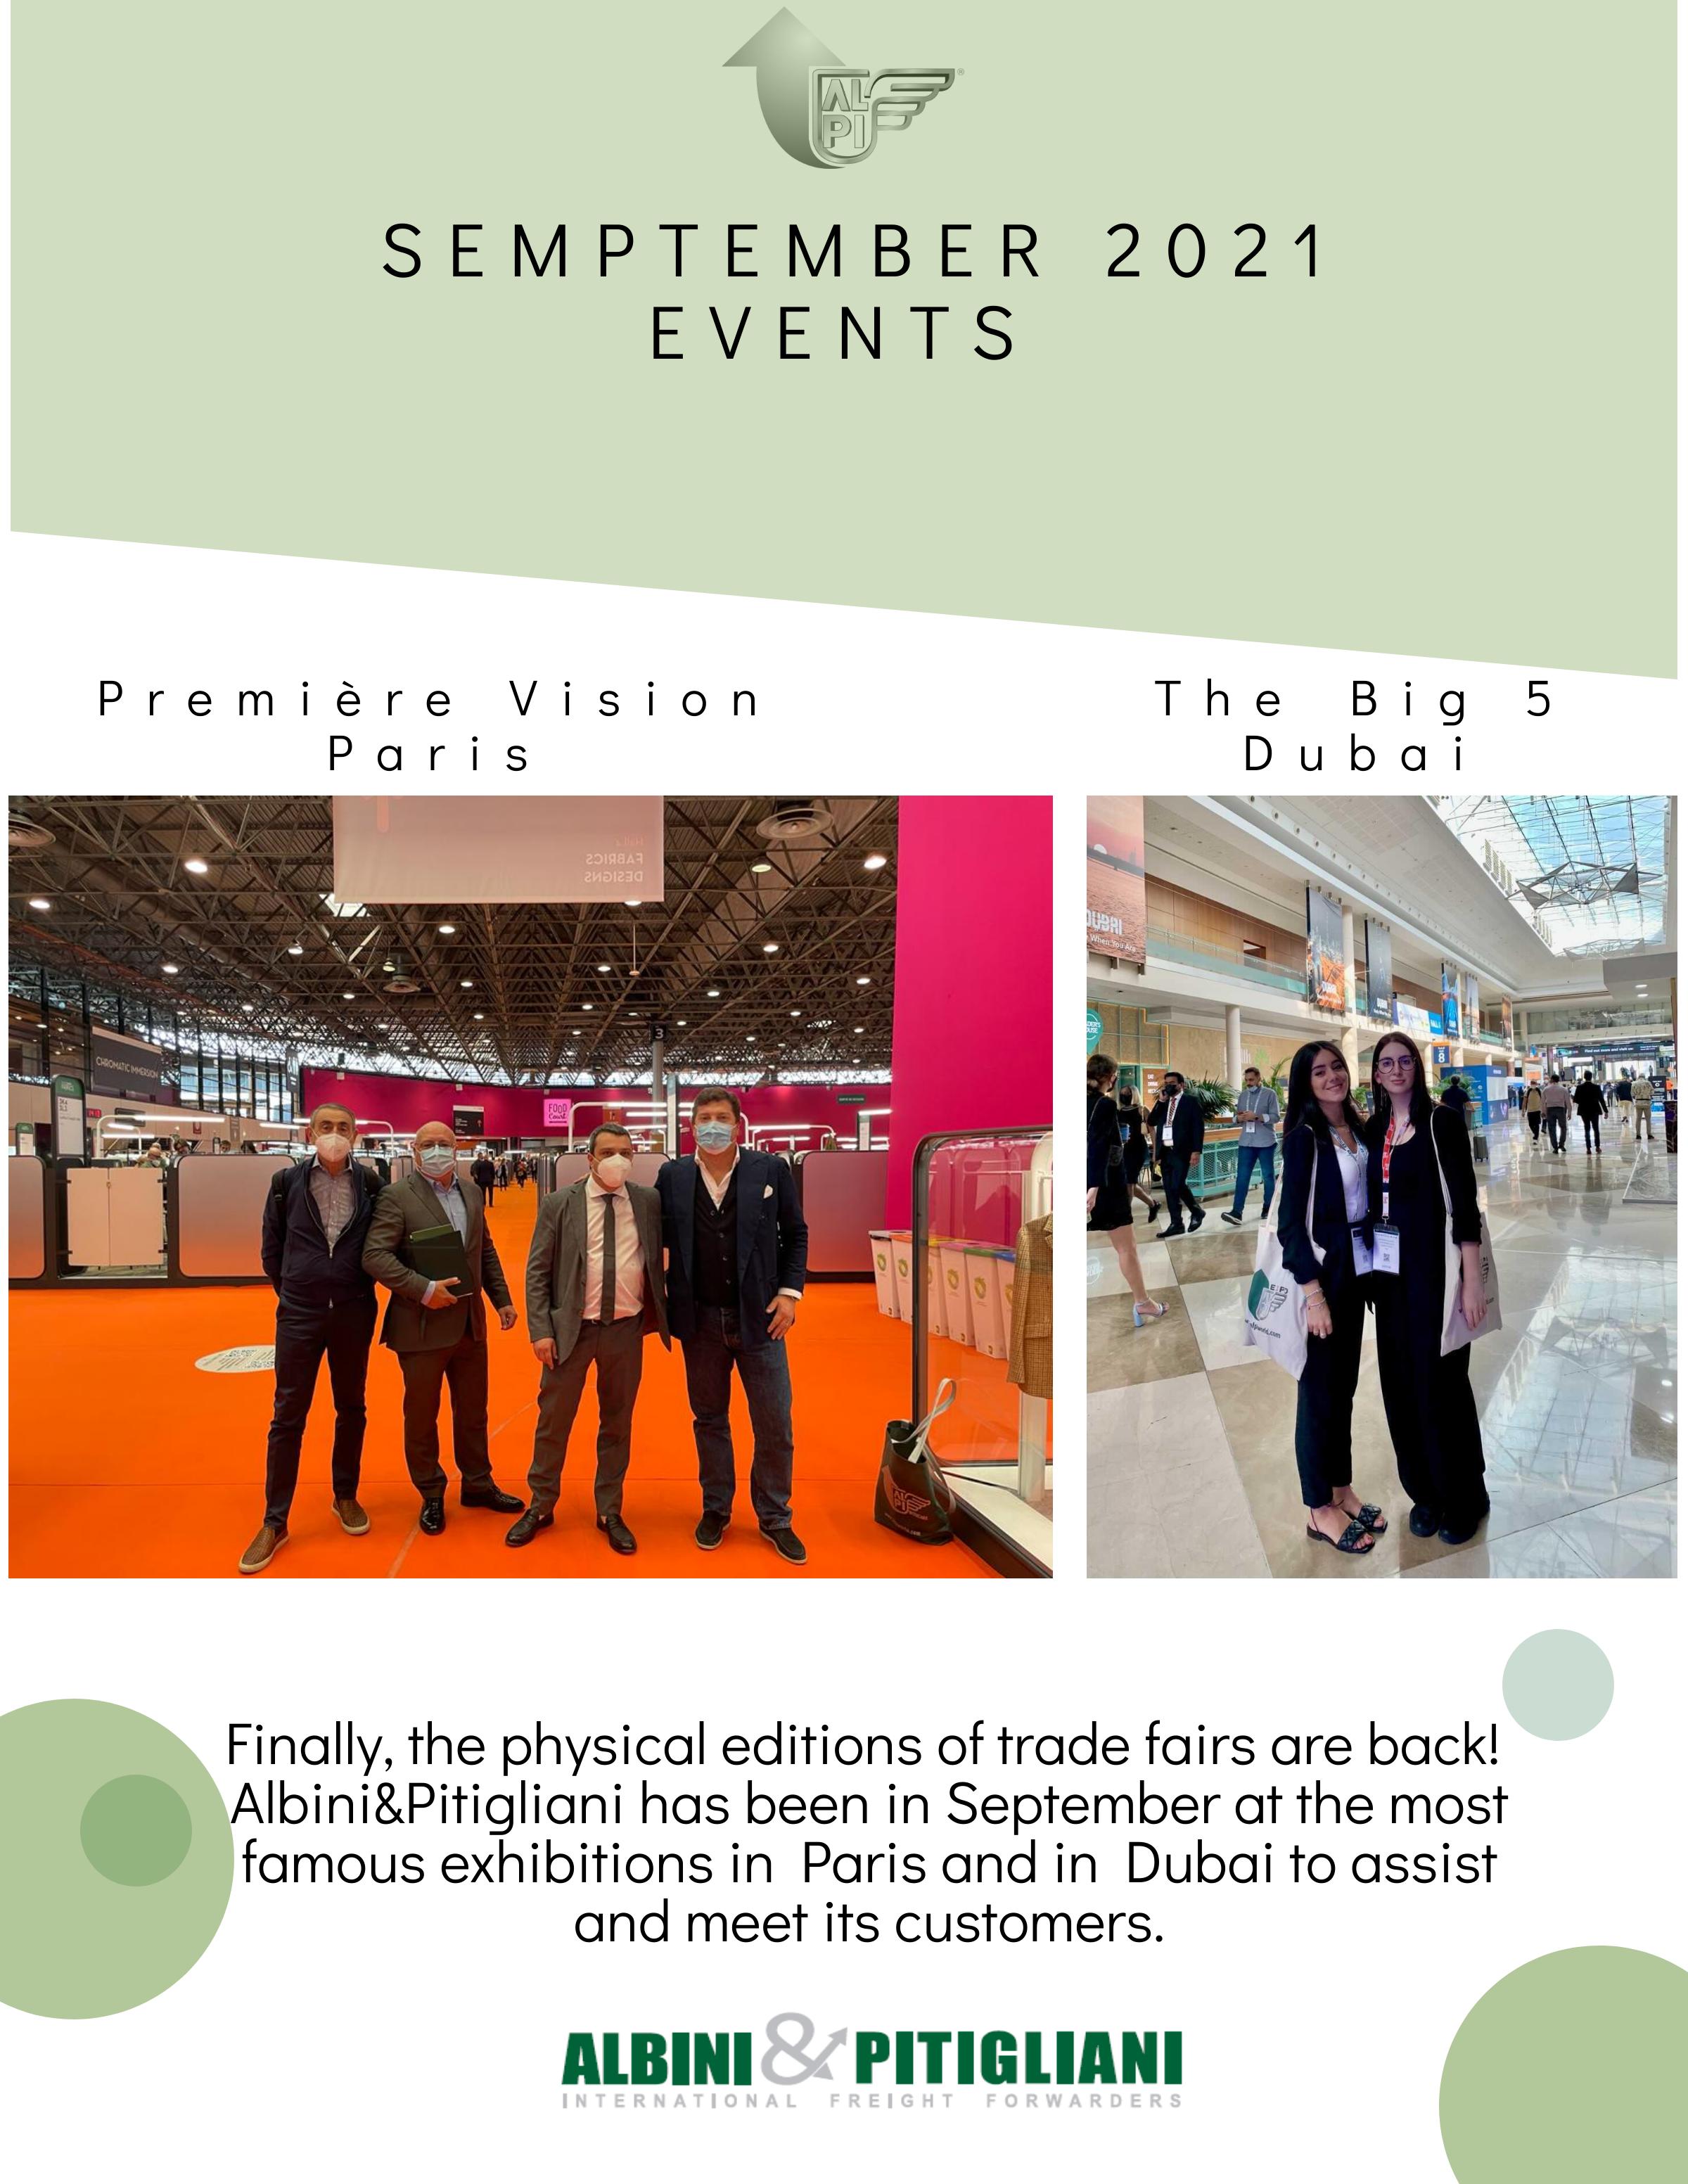 Alpi at the international exhibitions - September 2021